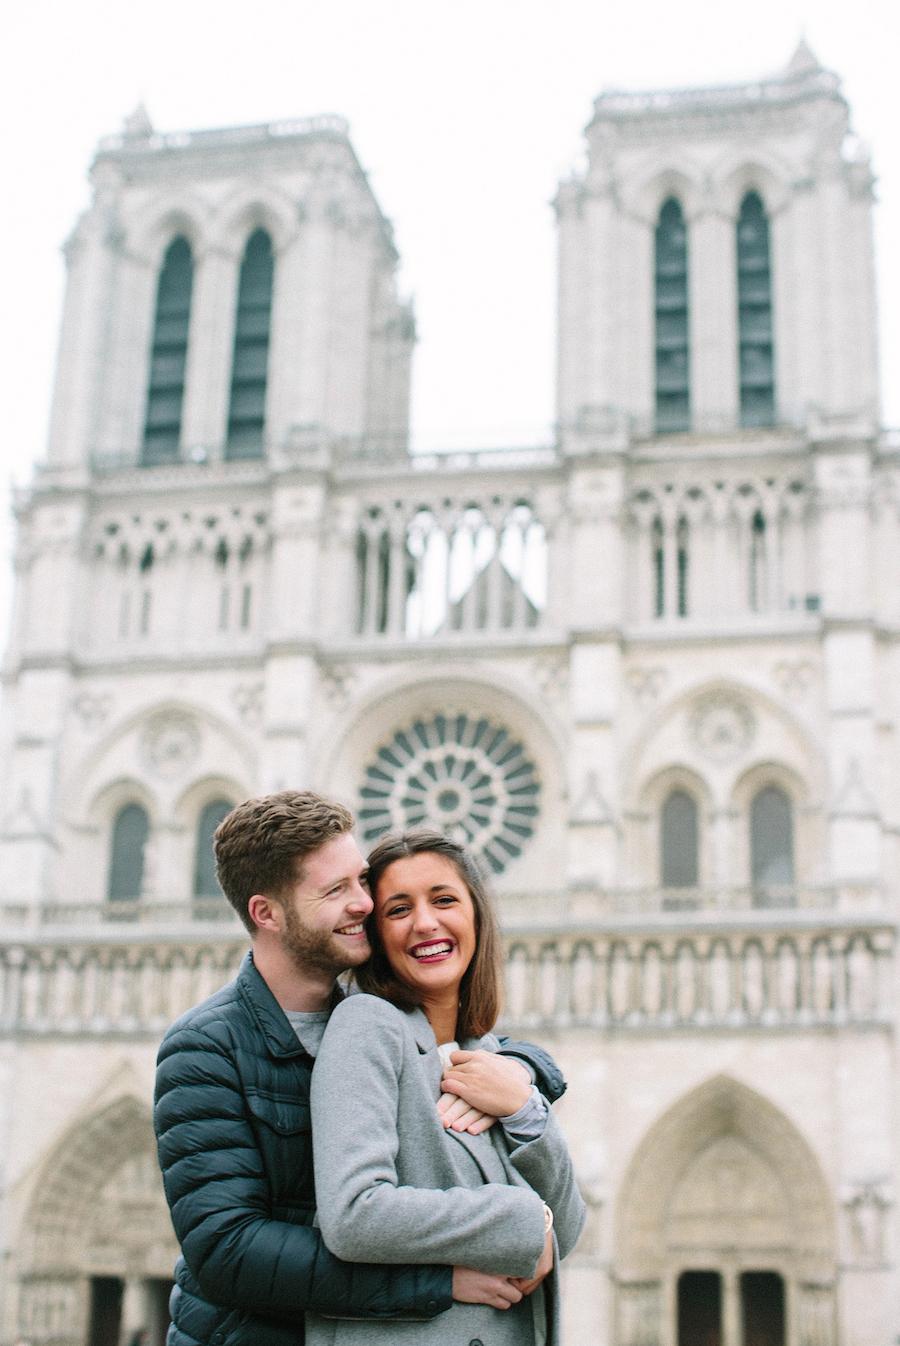 saya-photography-pre-wedding-couple-engagement-paris-quartier-latin-5.jpg